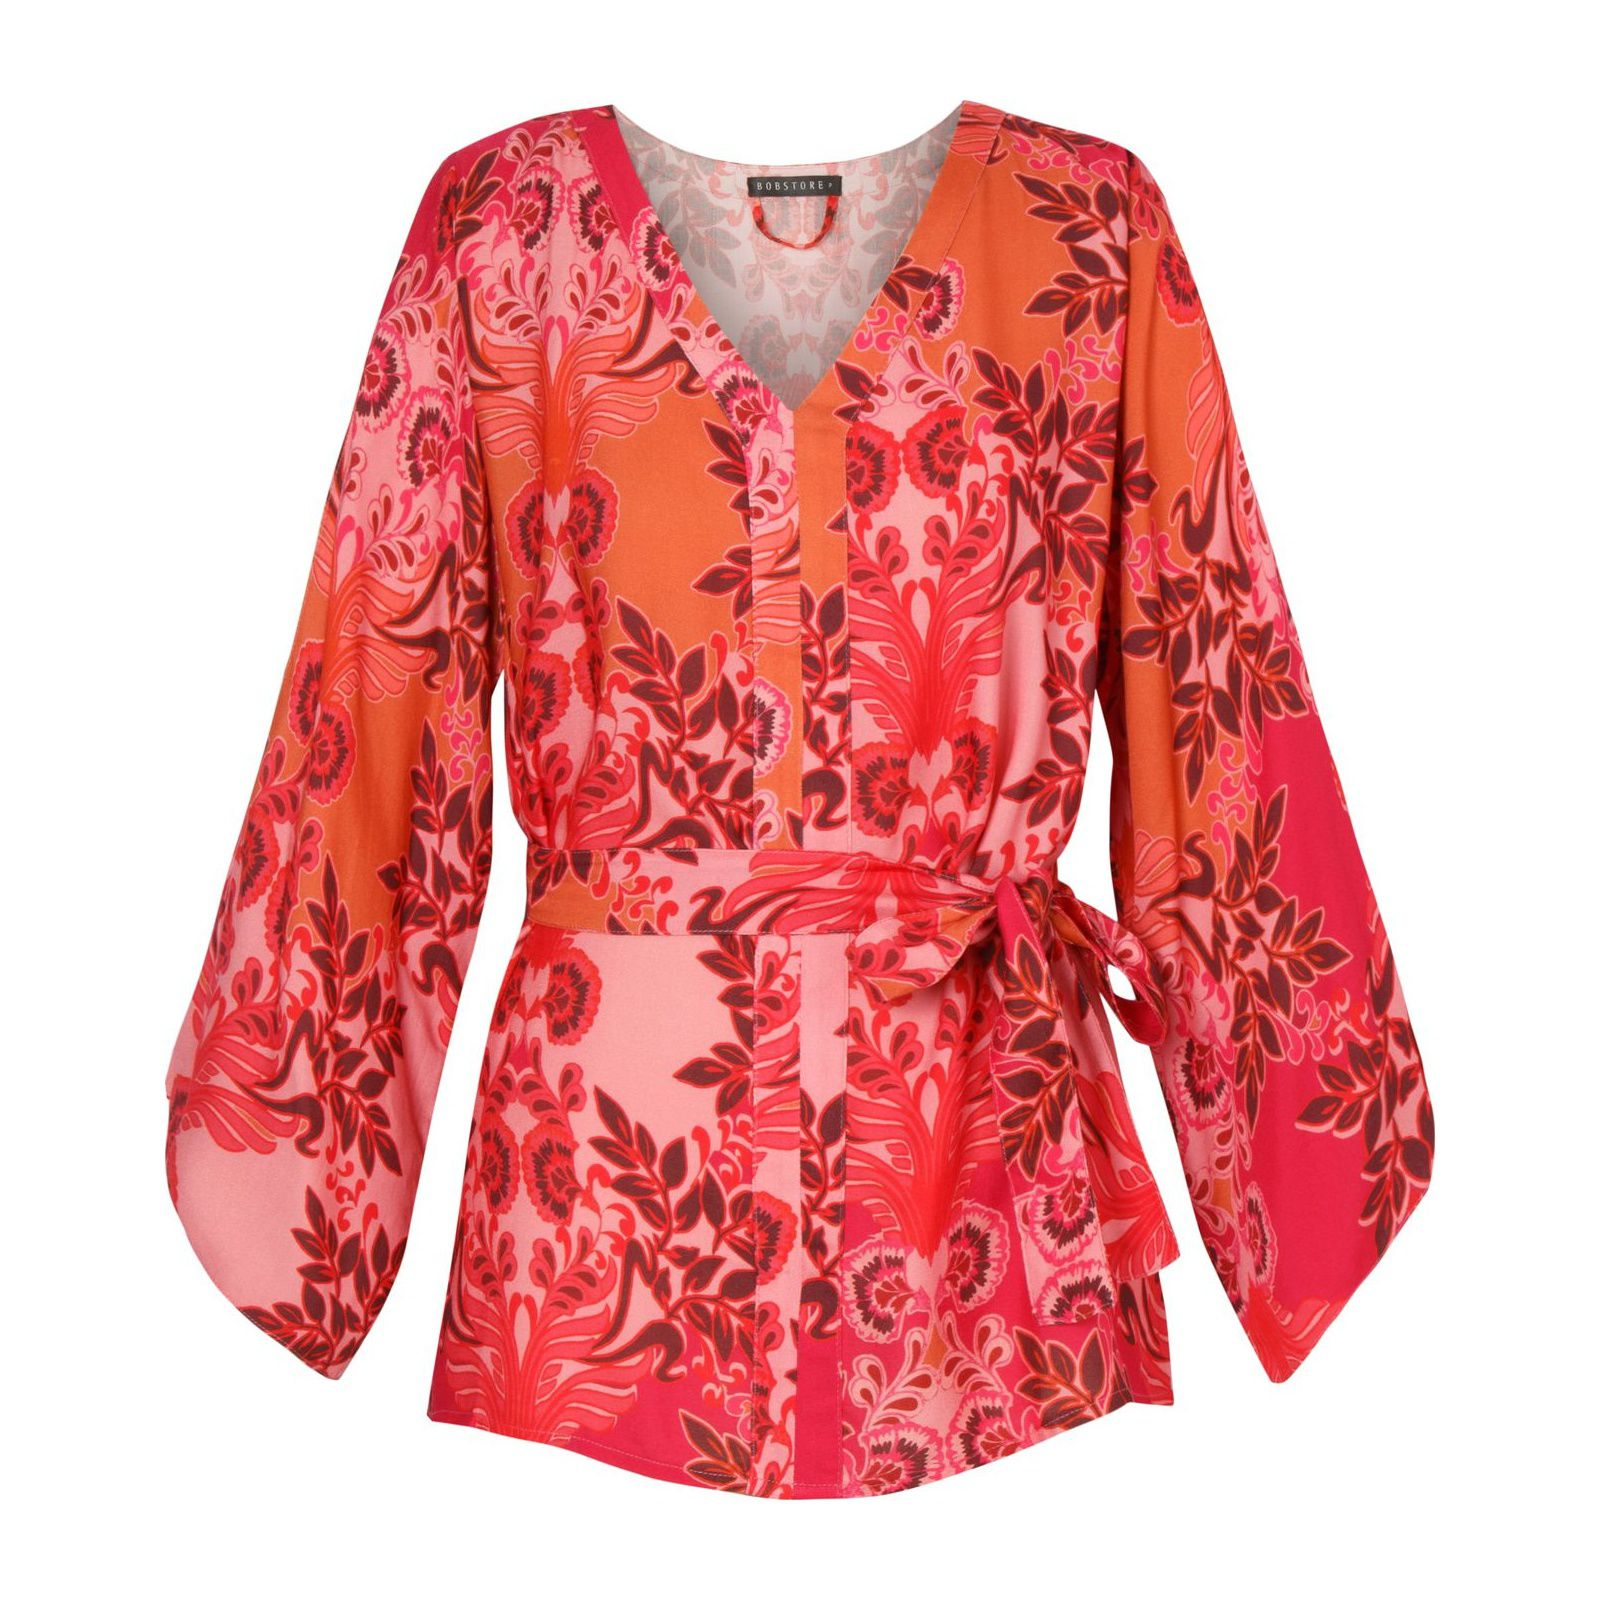 Blusa Bobstore Nipo Flower - Vermelha